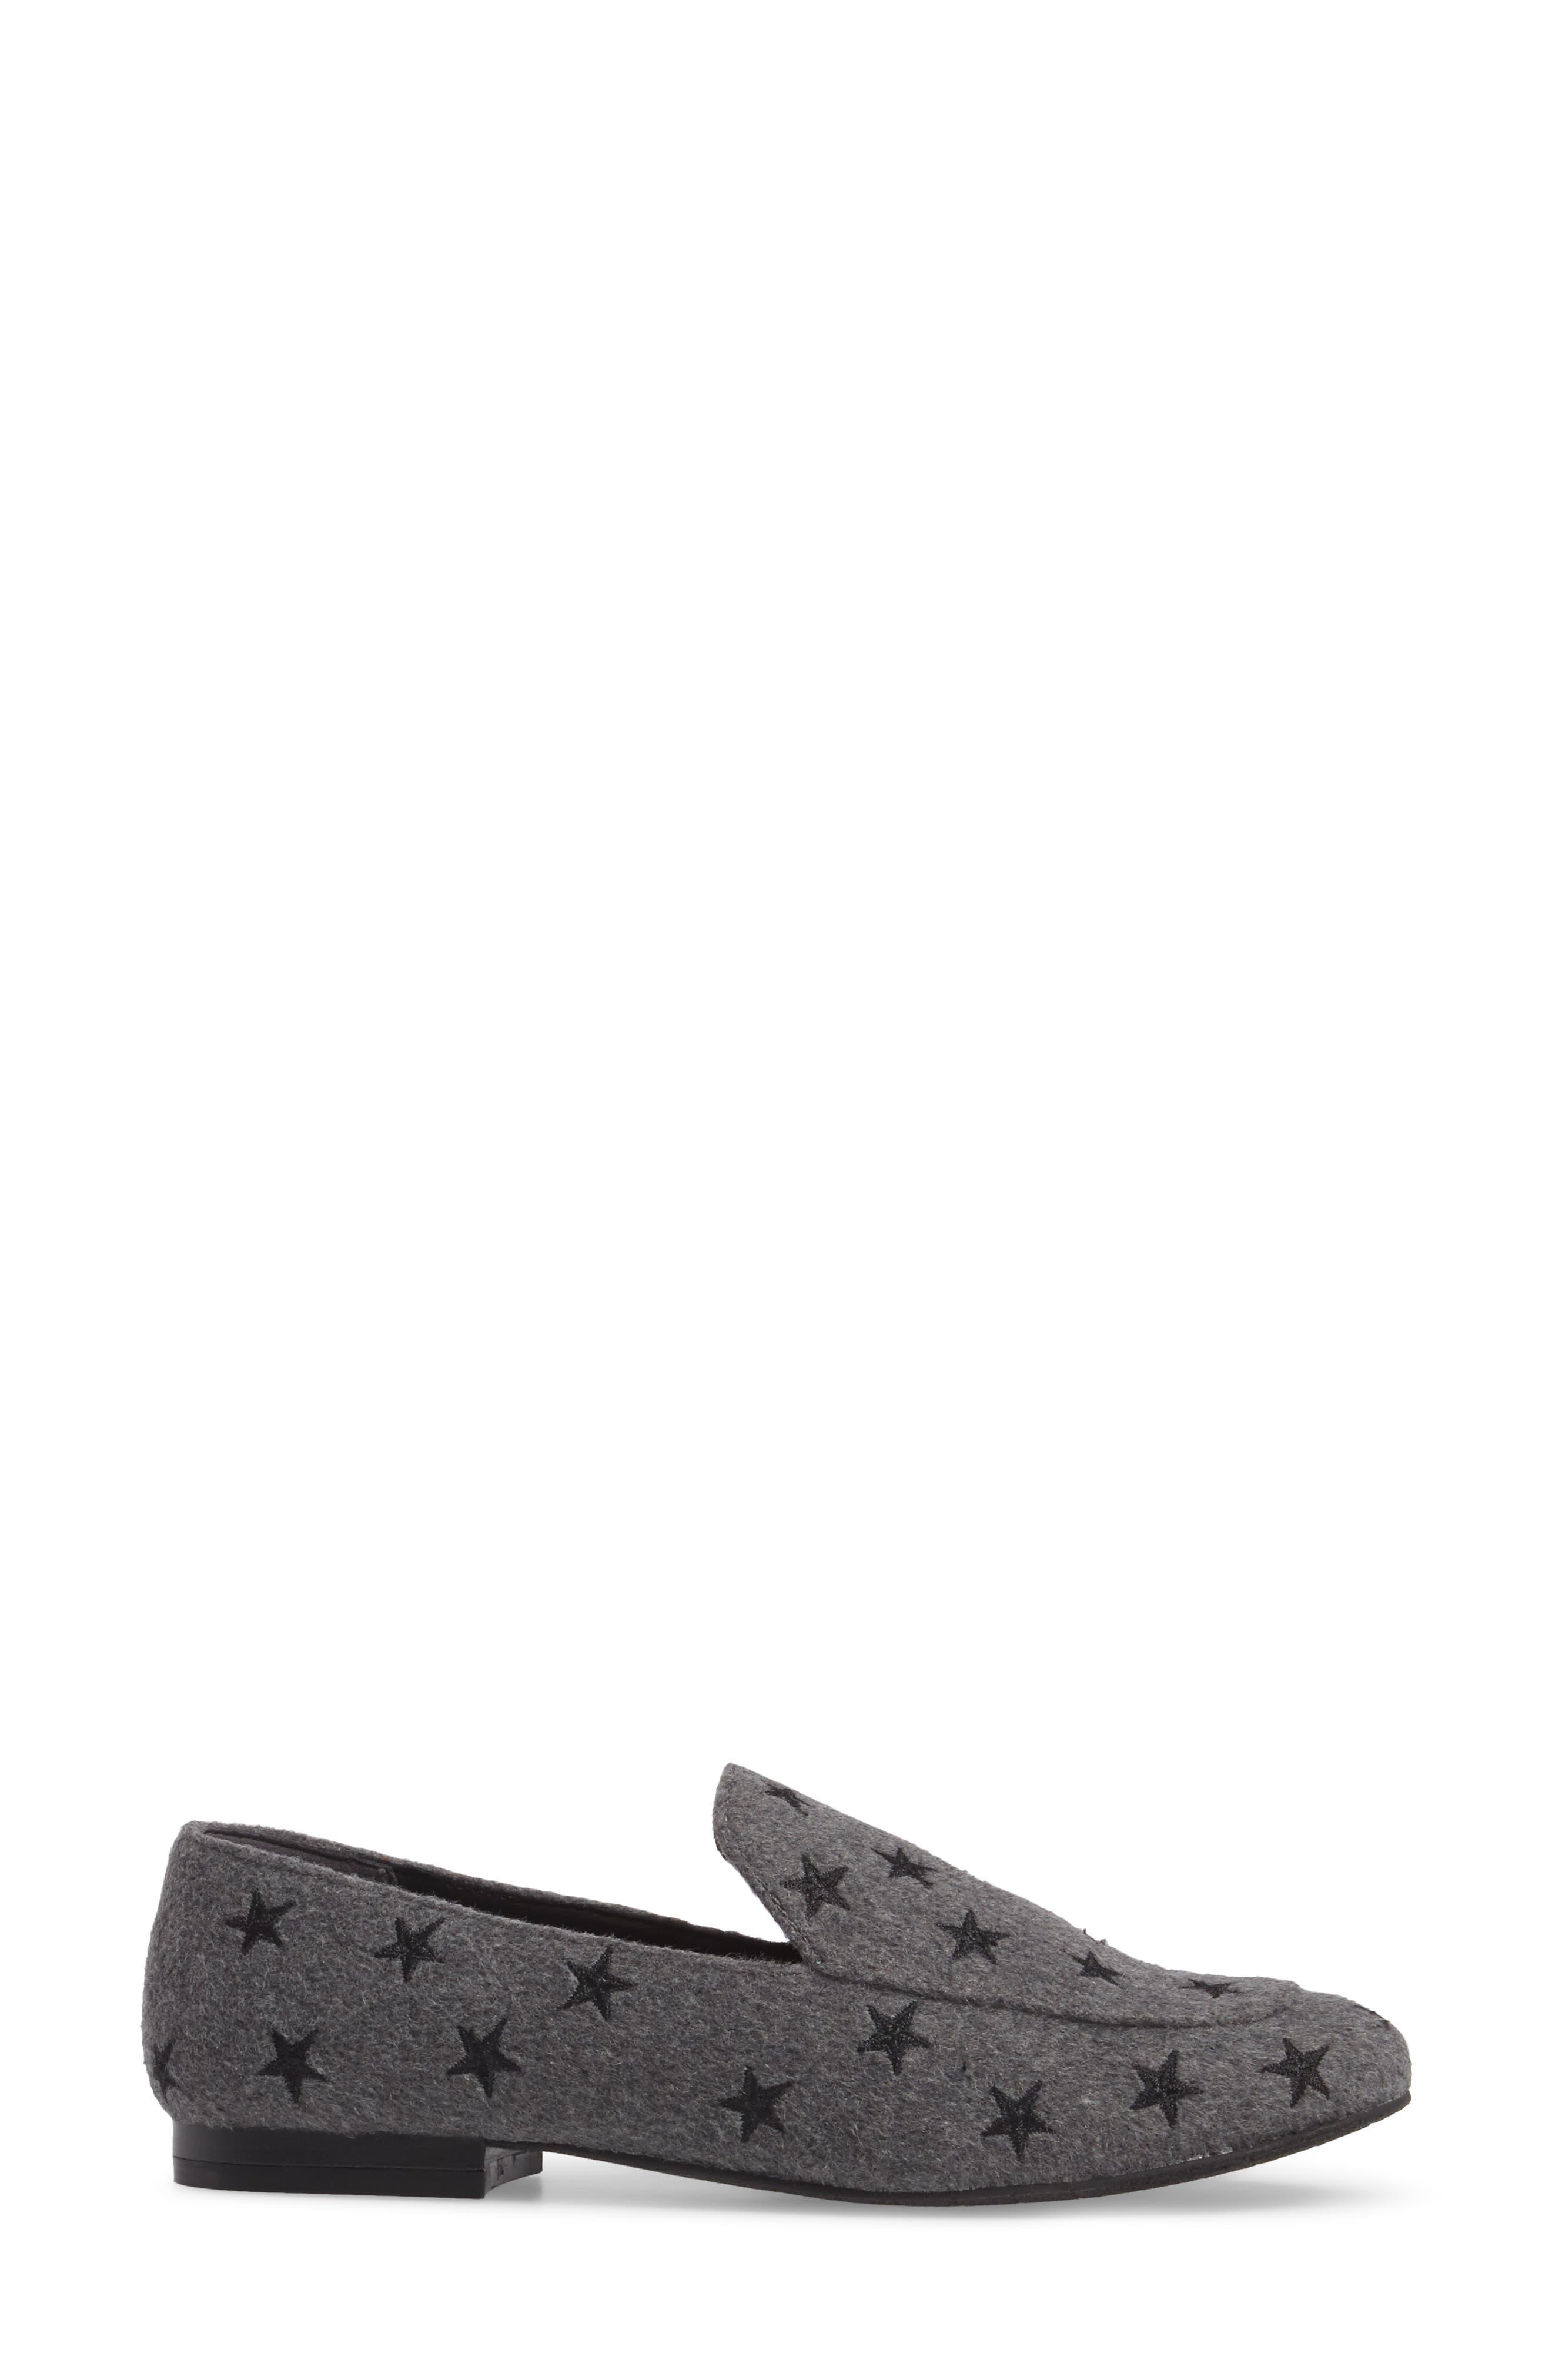 Westley 5 Loafer,                             Alternate thumbnail 3, color,                             020